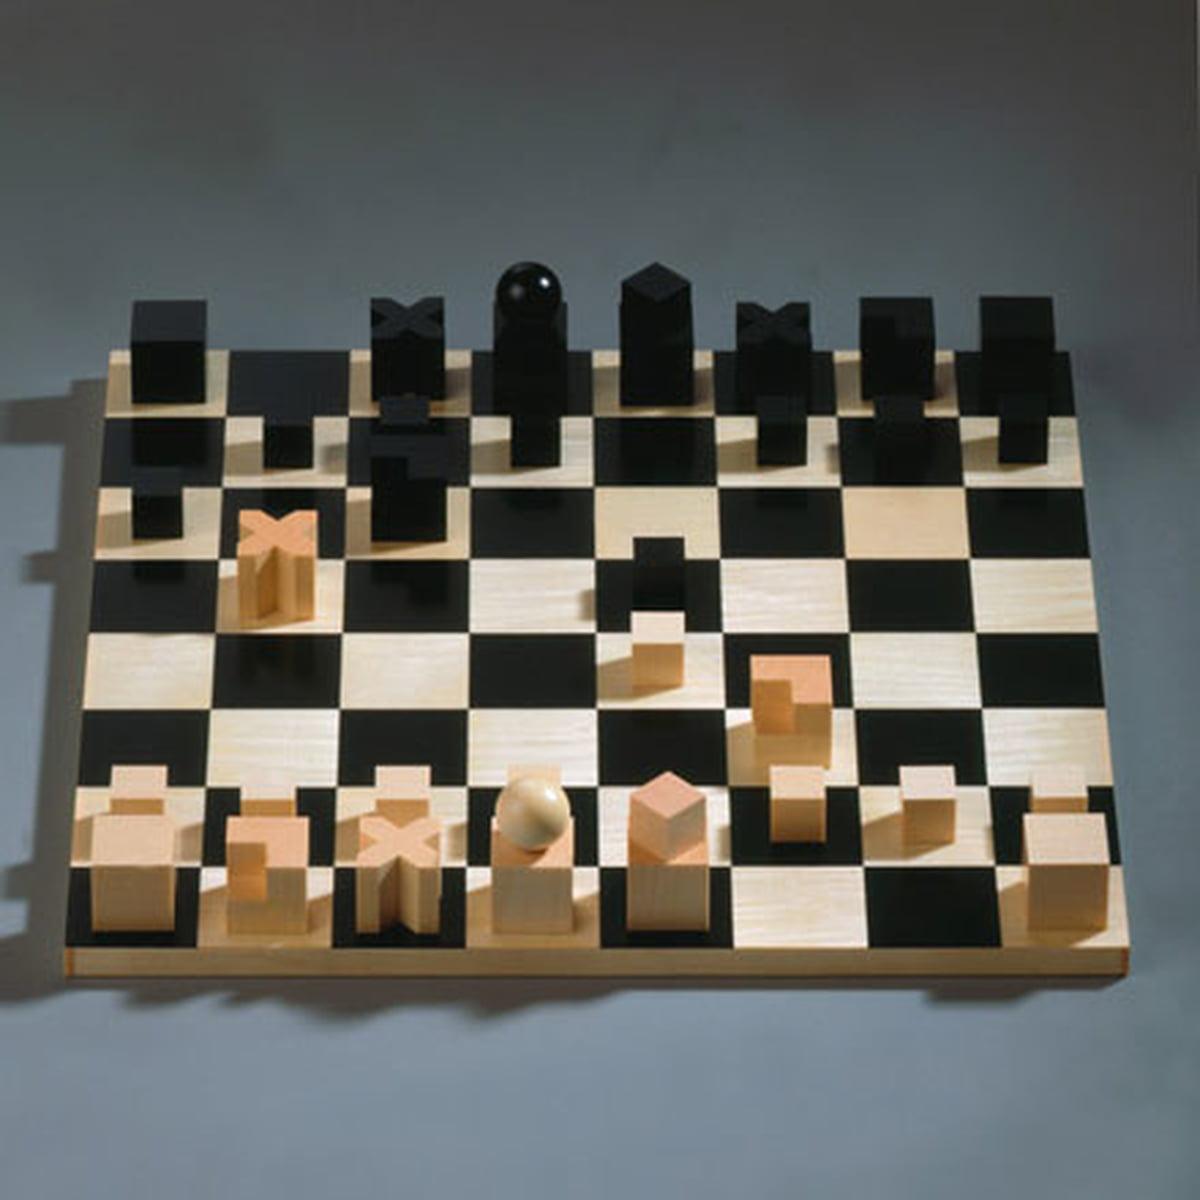 Bauhaus Chess Set Naef Spiele Shop